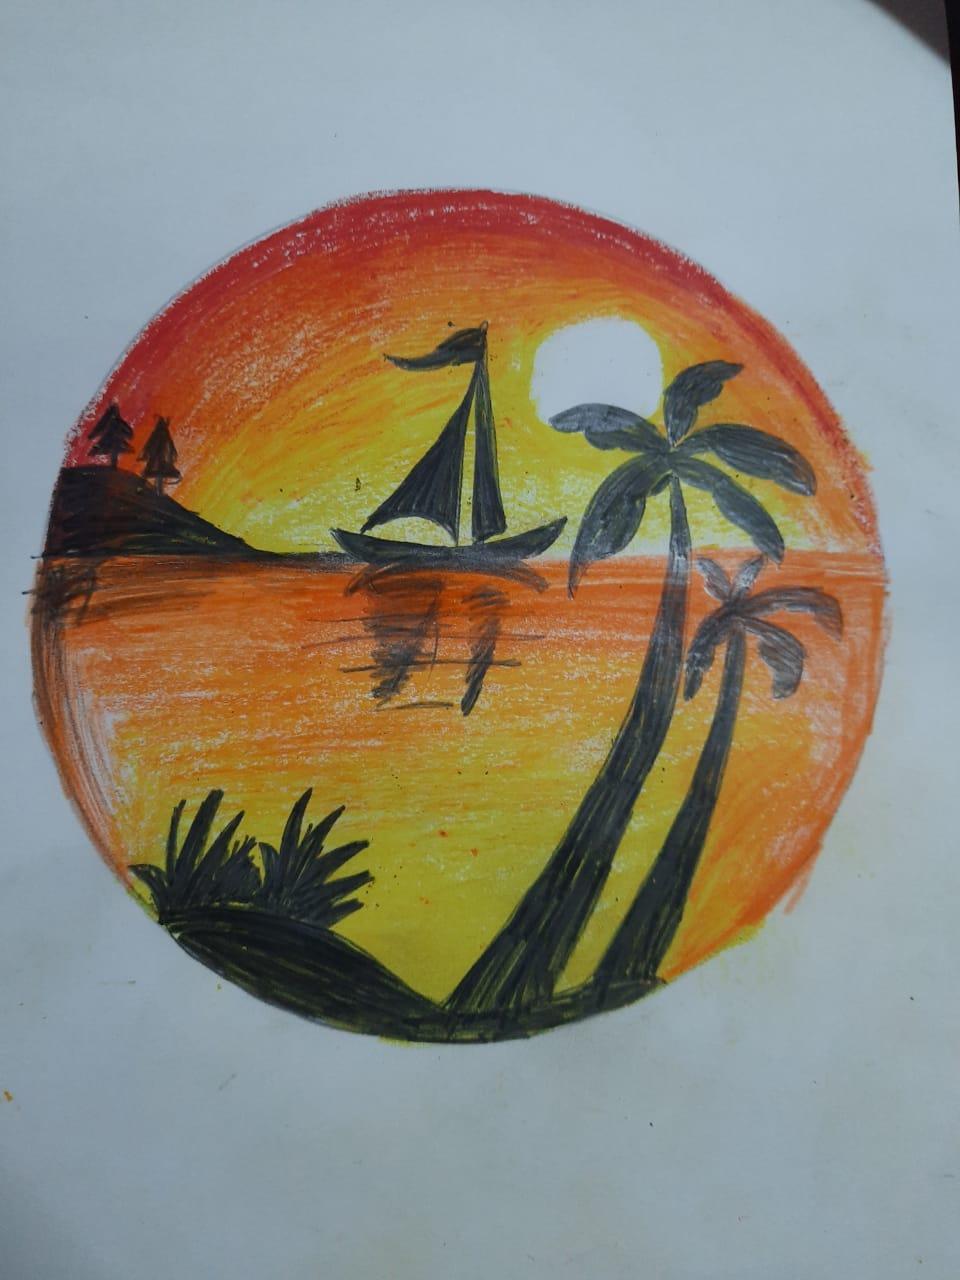 Pranavi's Painting 'The Sunset'